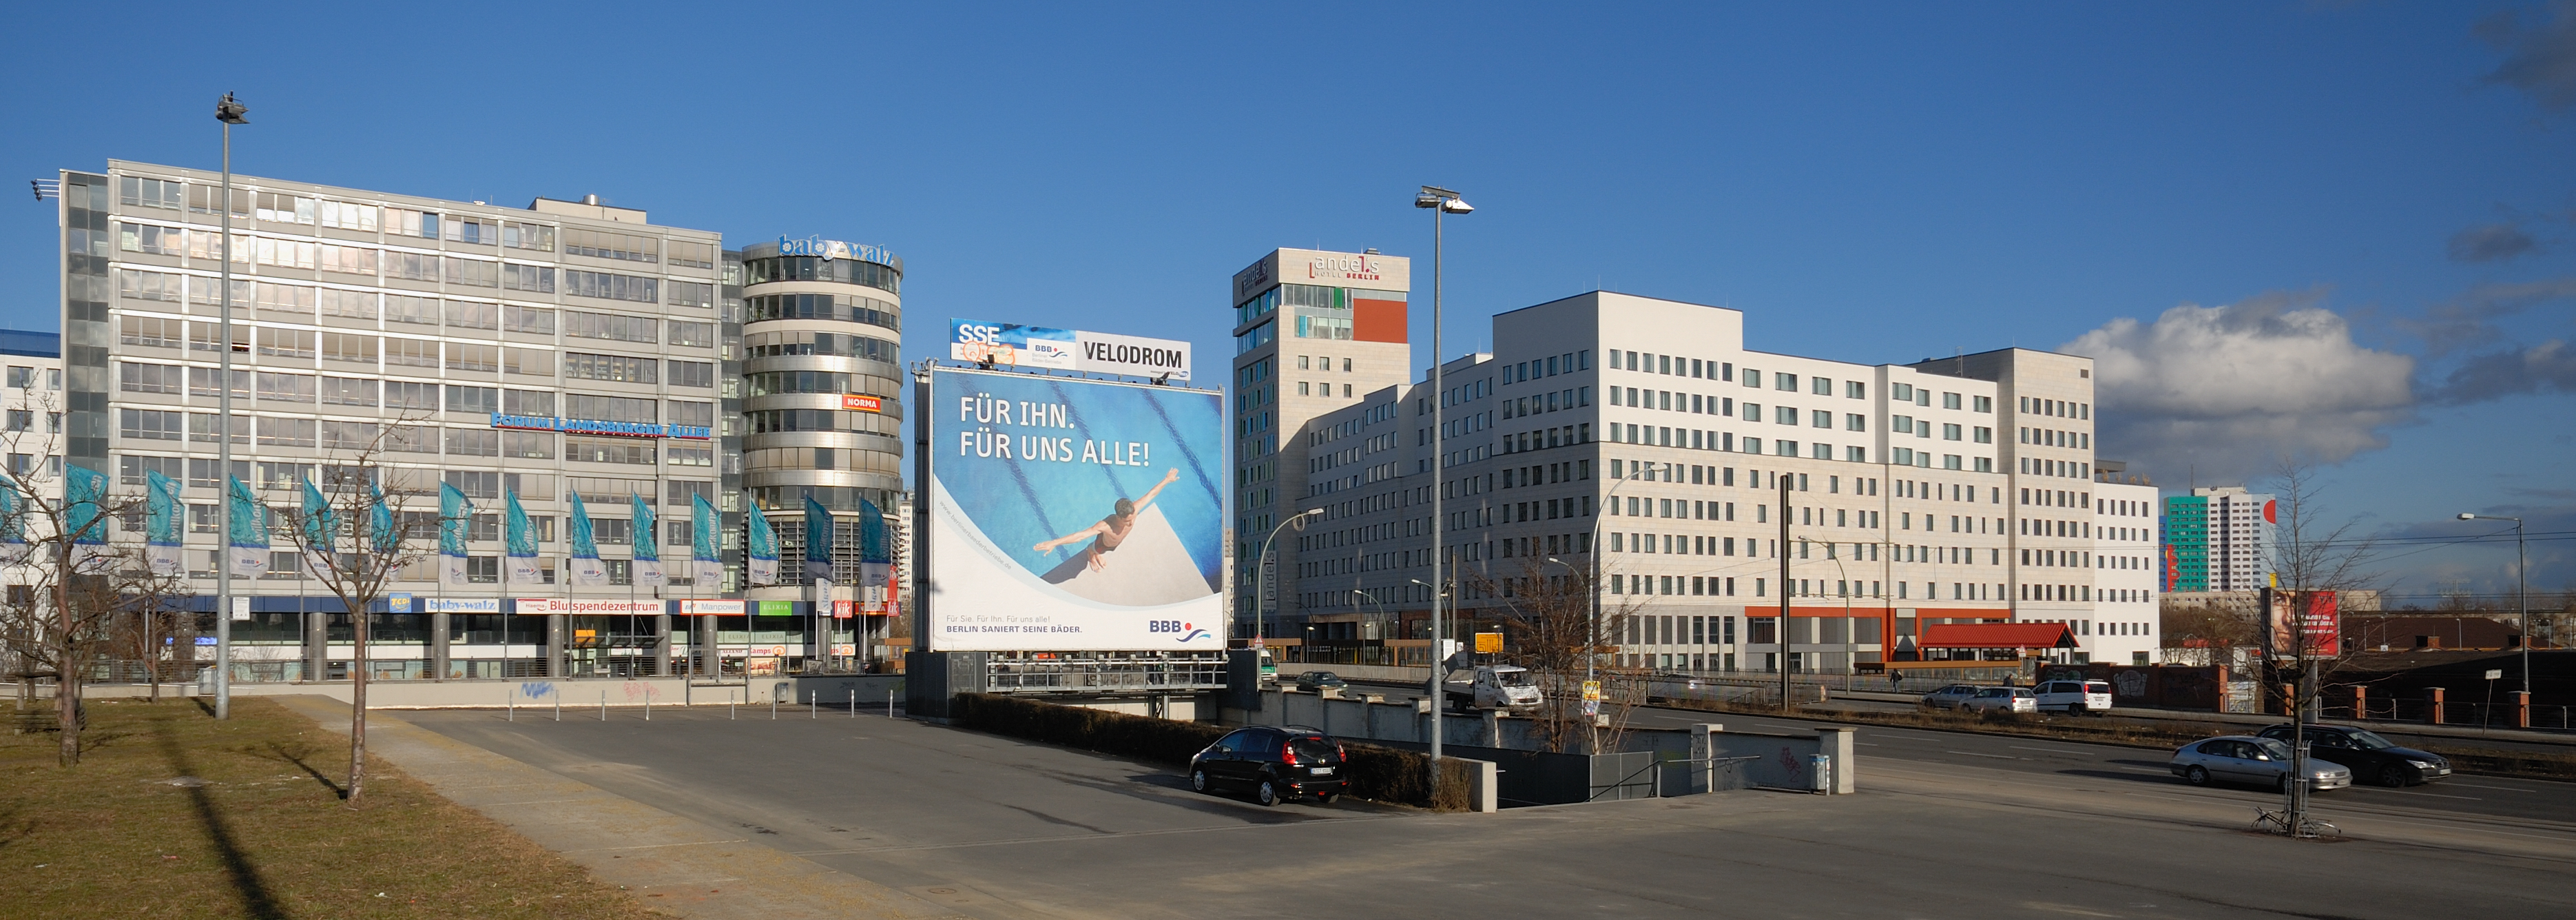 Andel S Hotel Landsberger Allee   Berlin